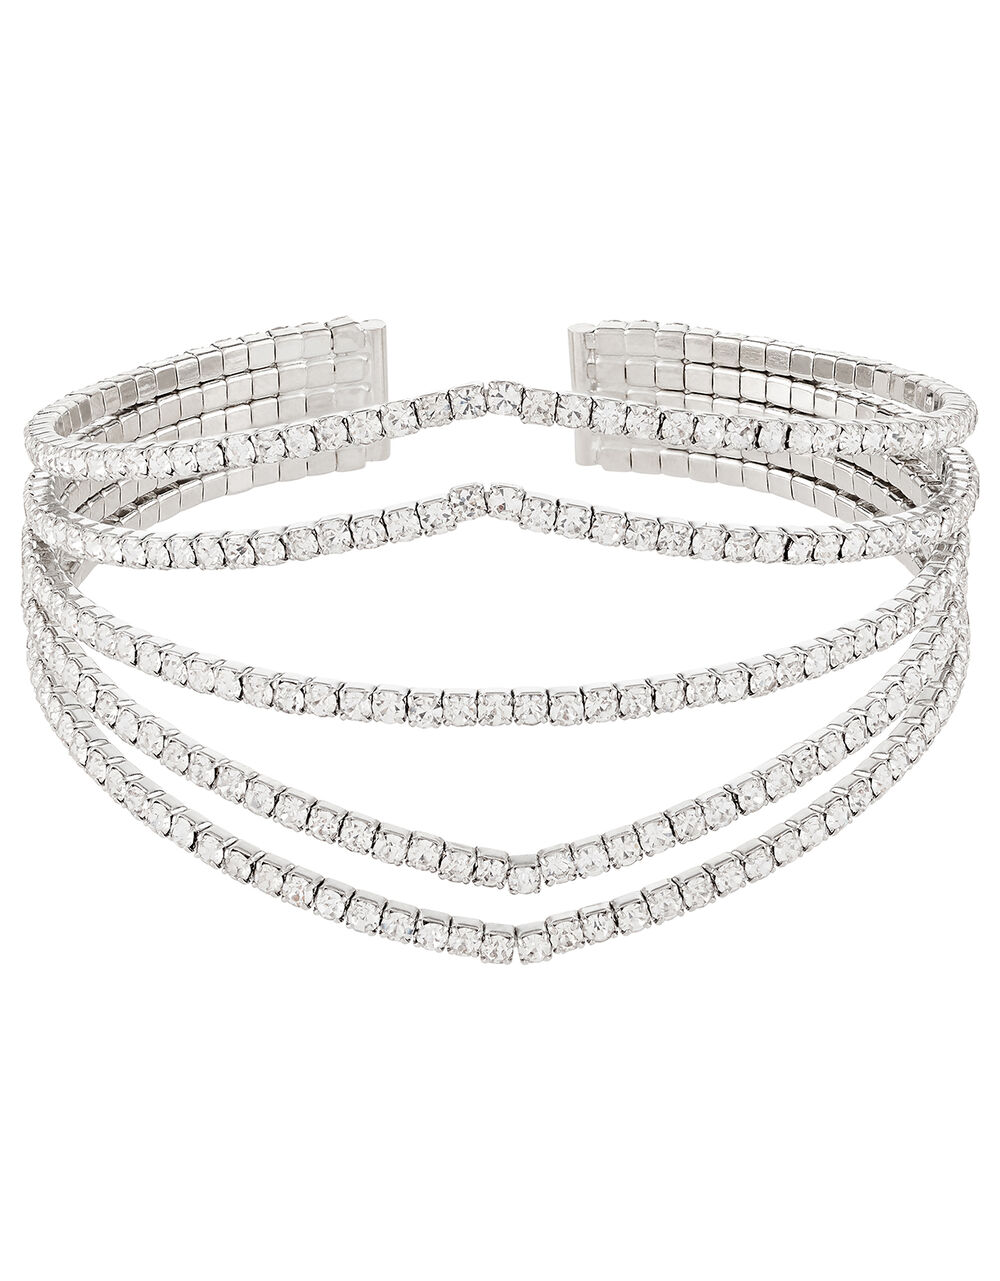 Multi-Band Diamanté Cuff Bangle, , large